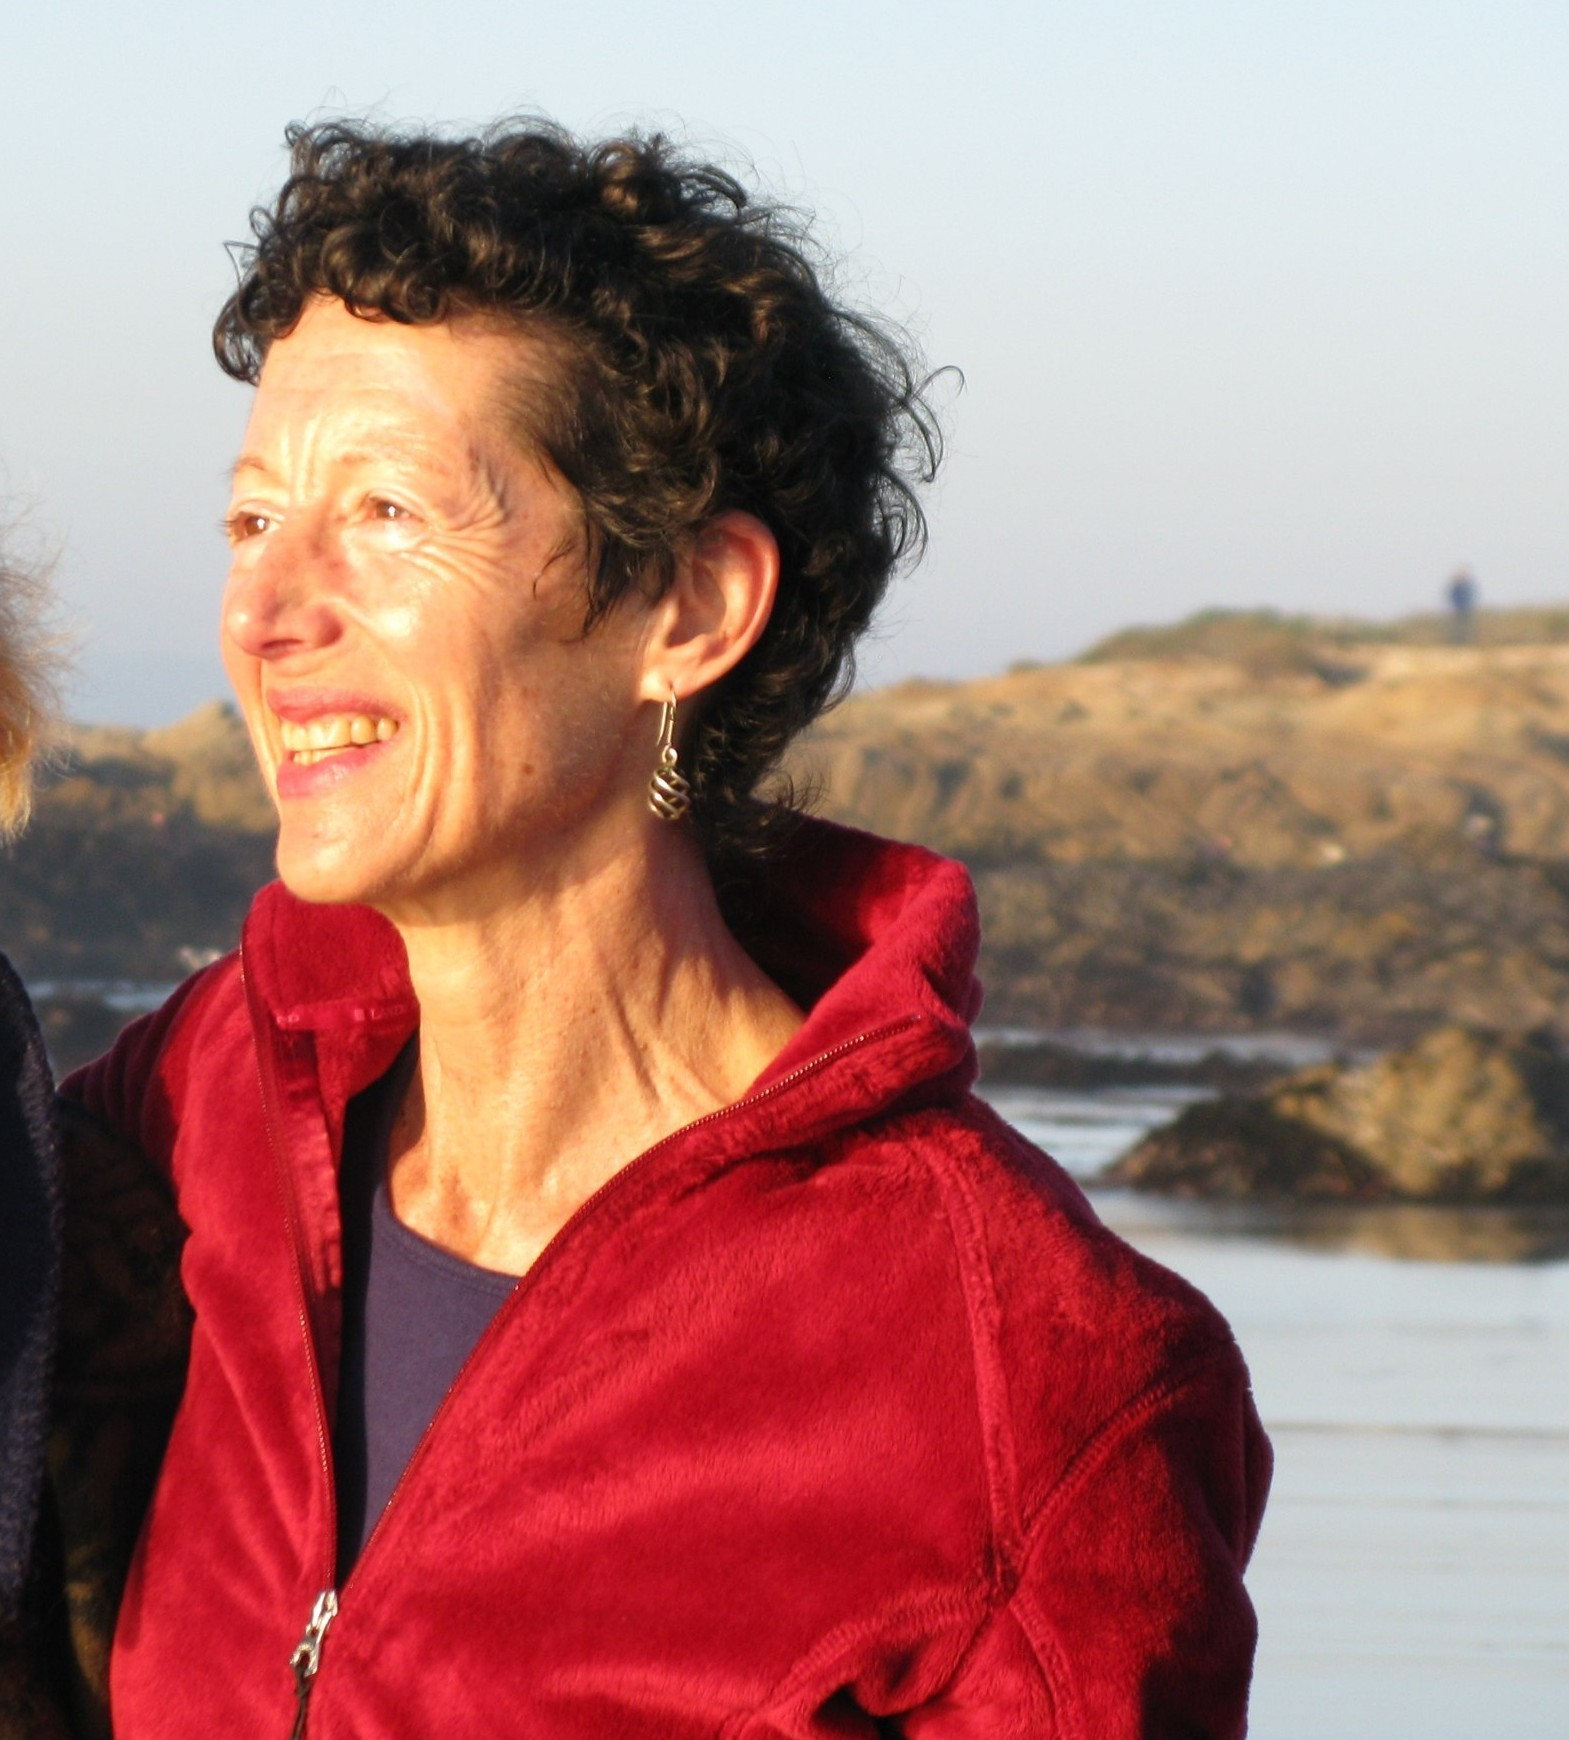 Image : Nancy gazing out at the Asilomar beach